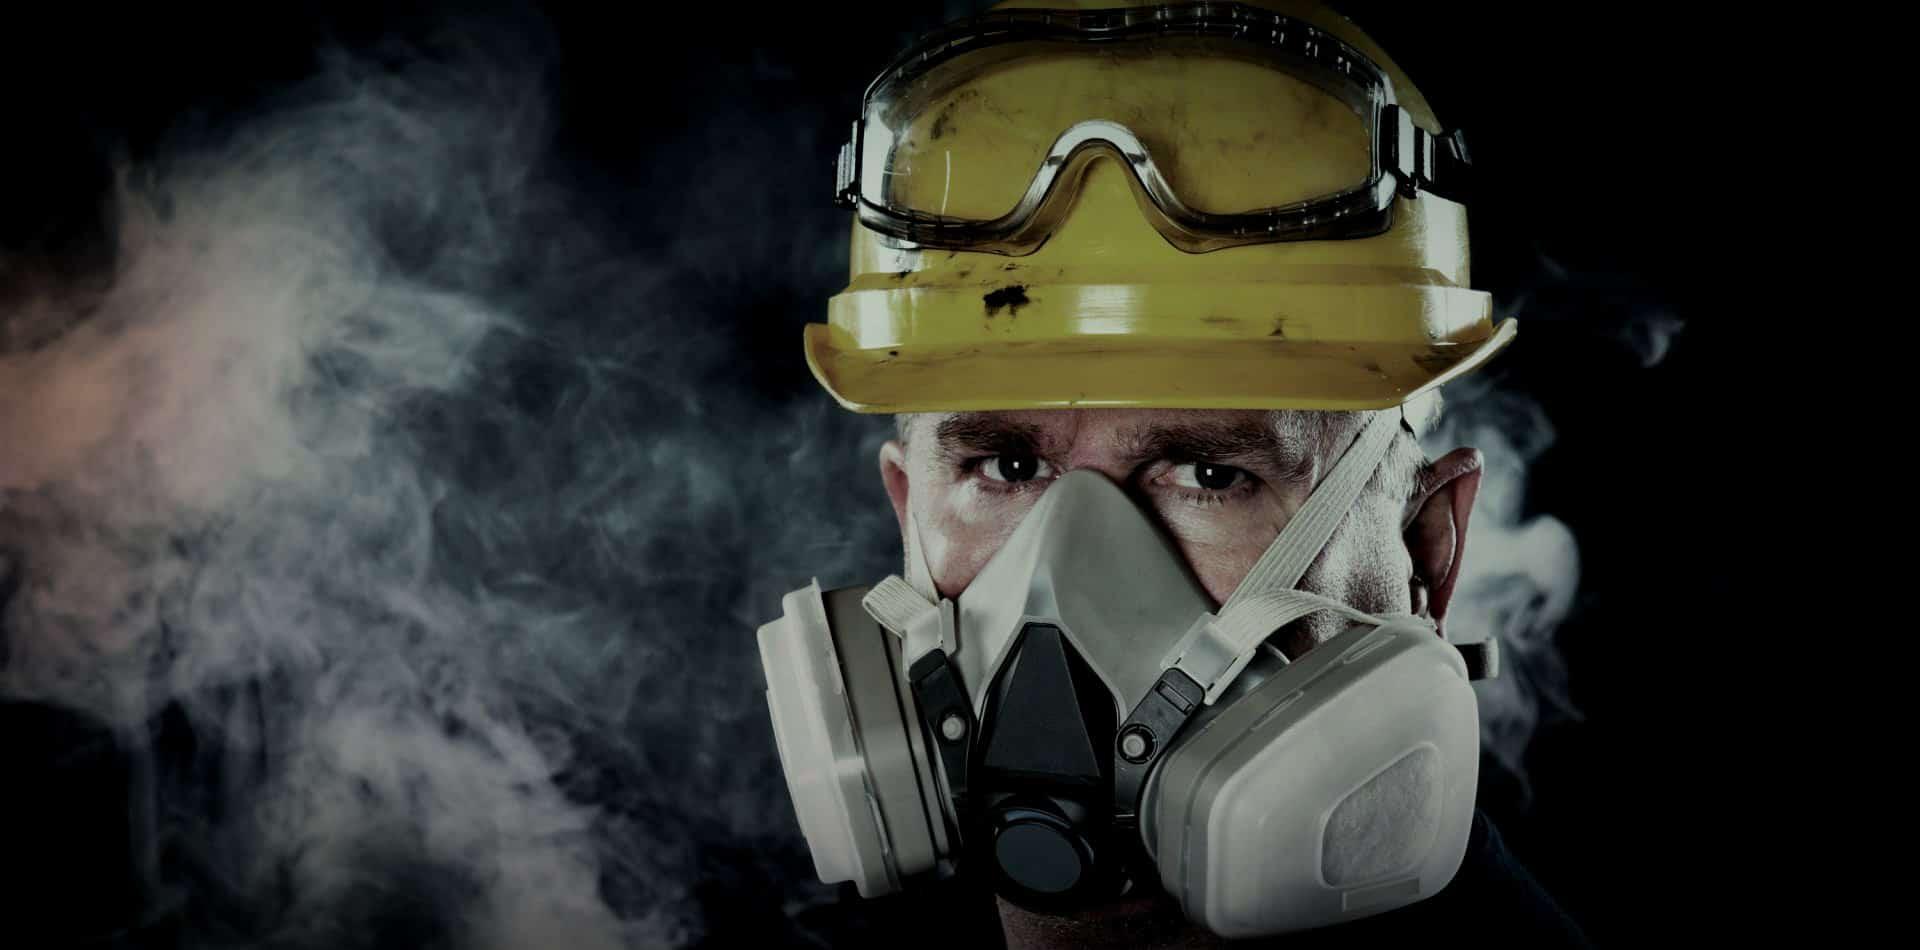 Remove friable asbestos Dandenong @ DANDENONG